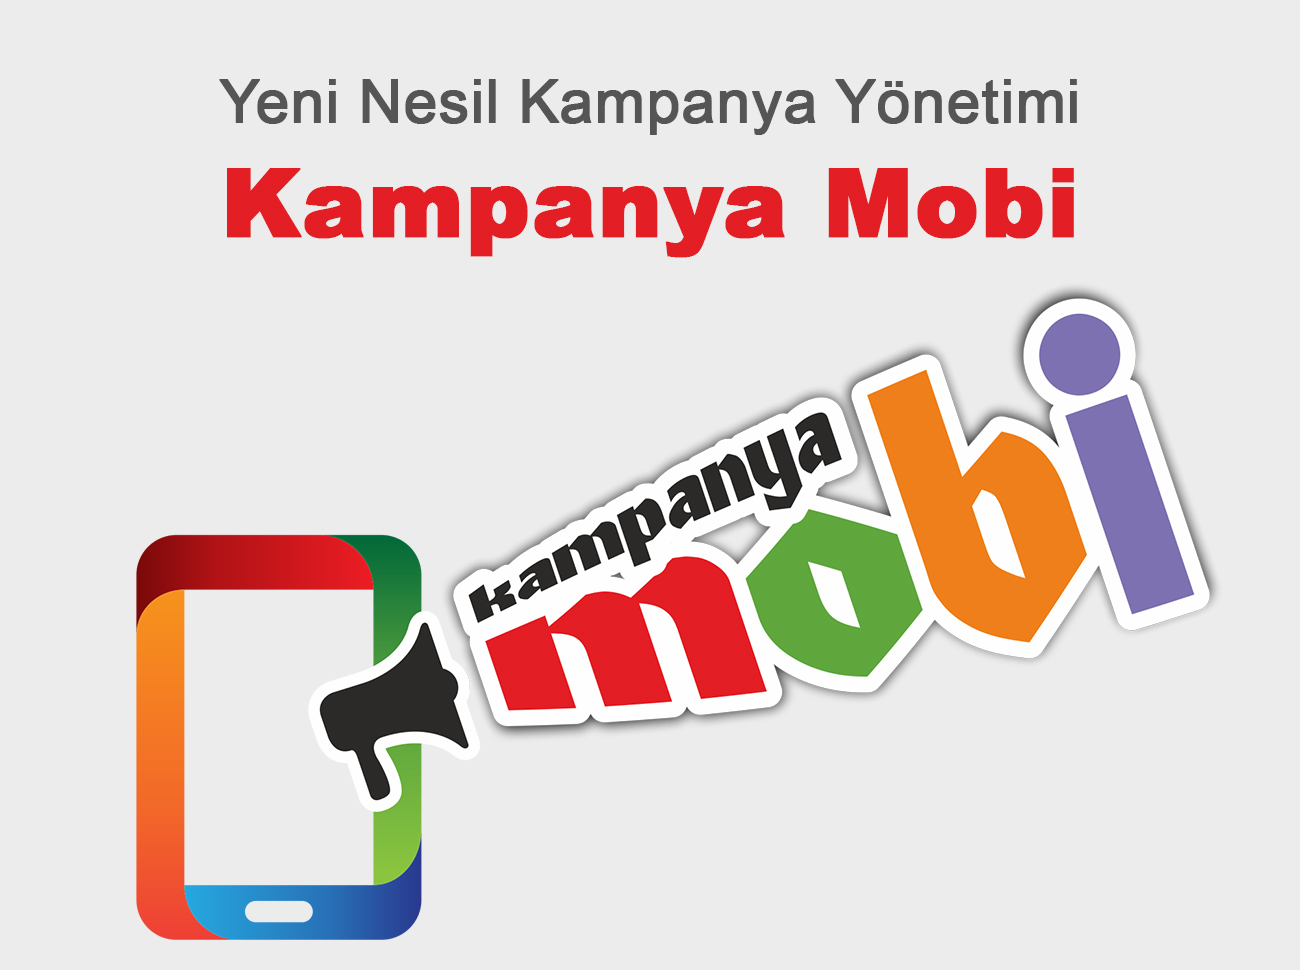 Yeni Nesil Kampanya Yönetimi: Kampanya Mobi